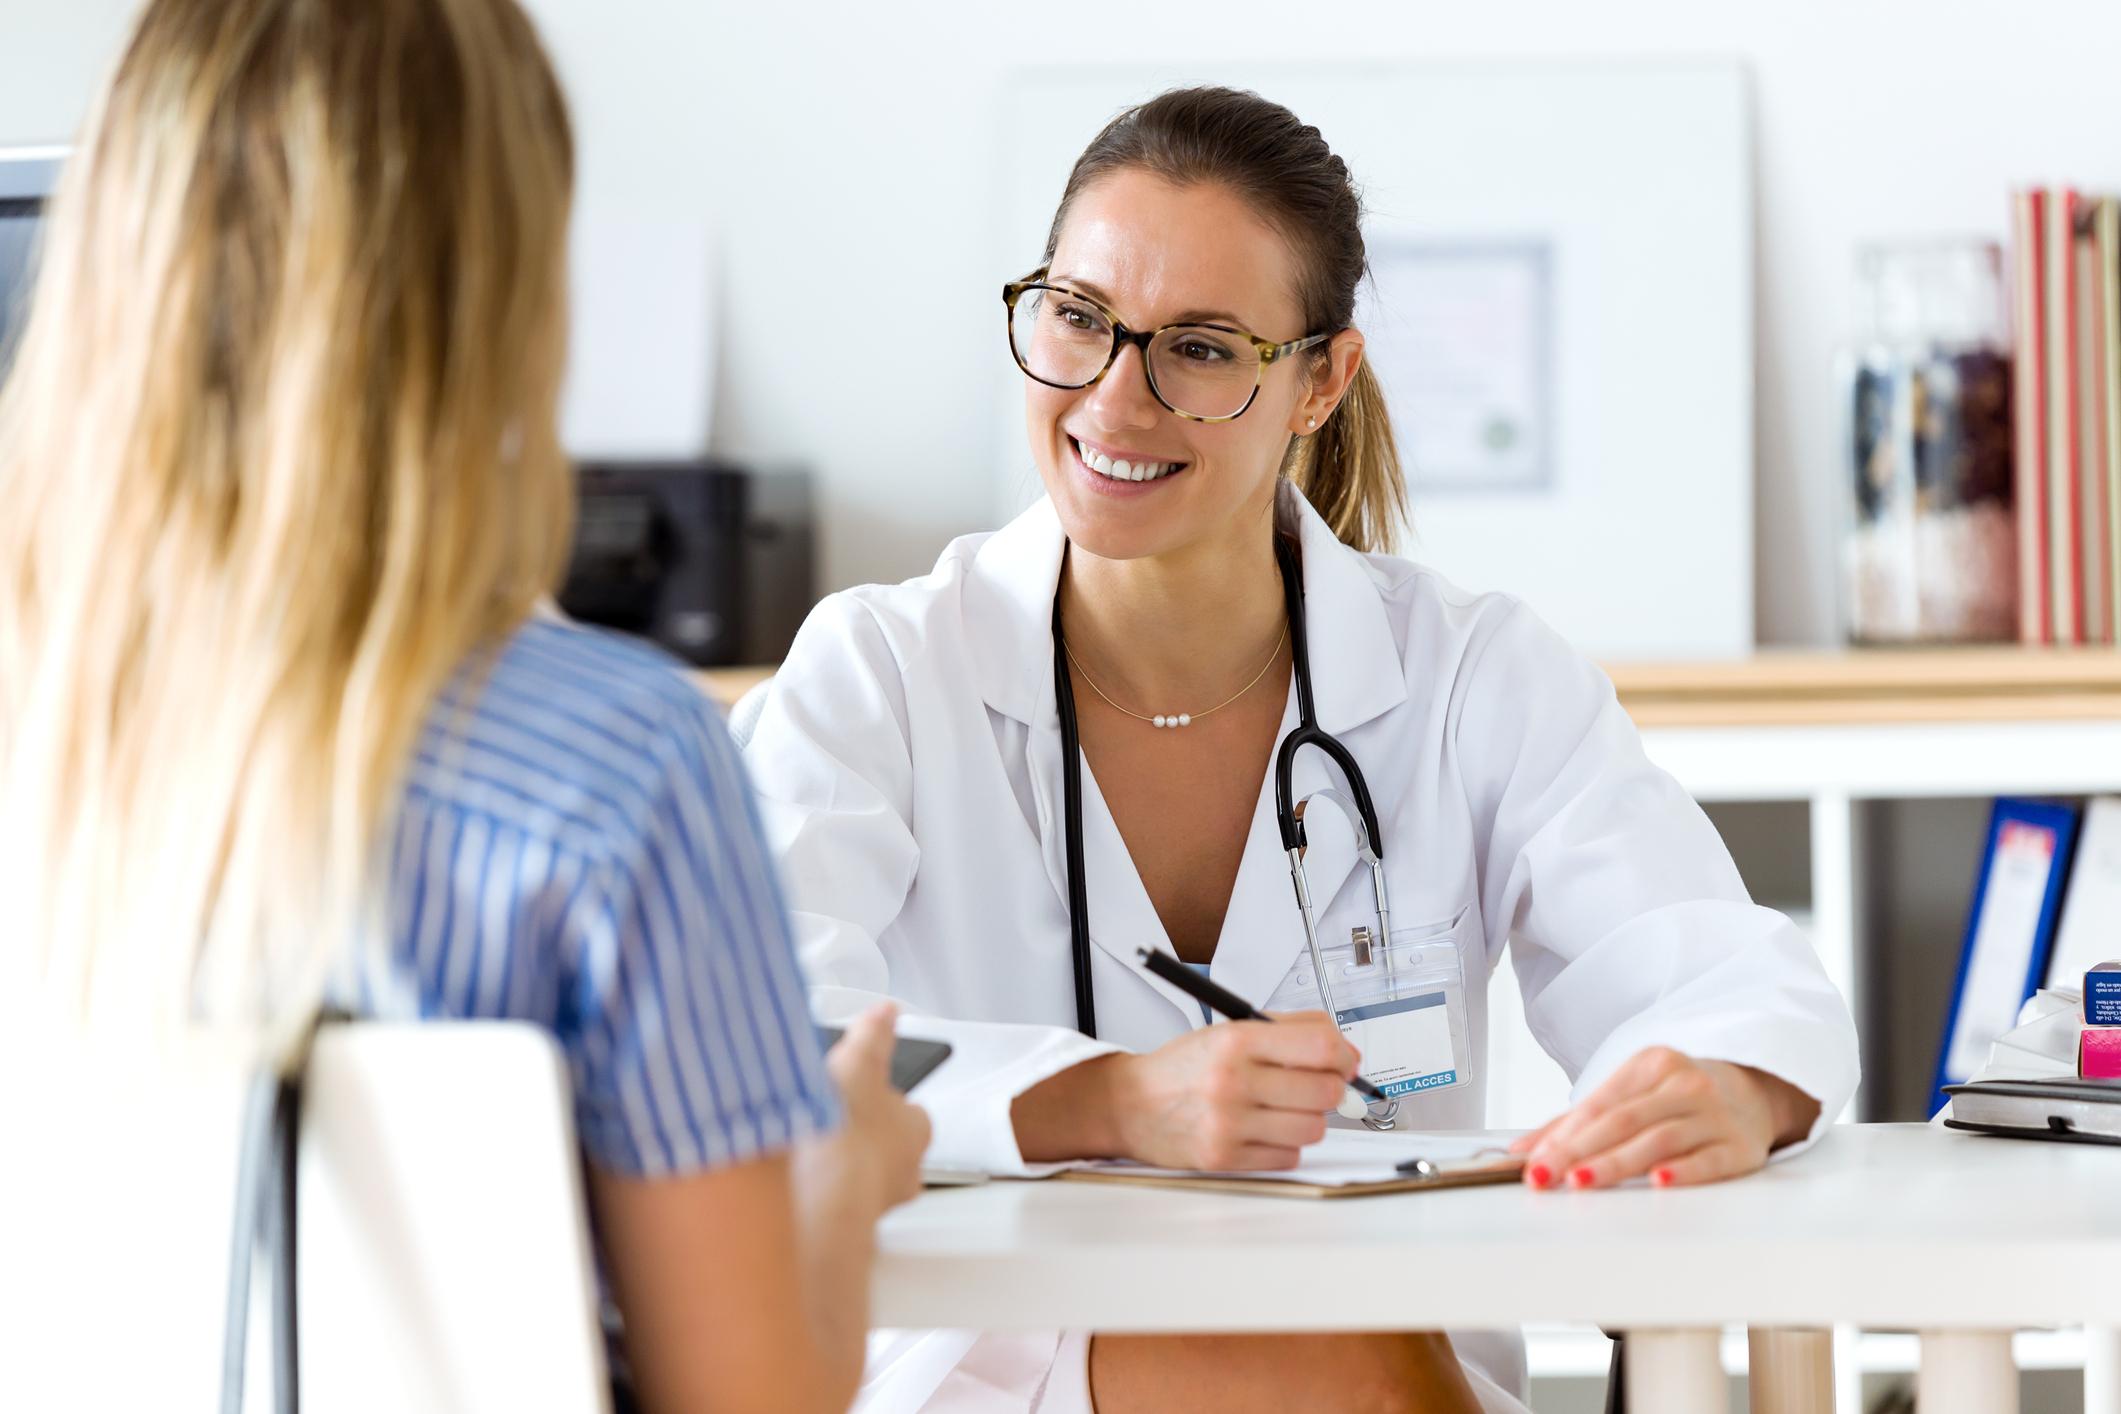 Richiesta Visita Medica Lavoratori Dipendenti